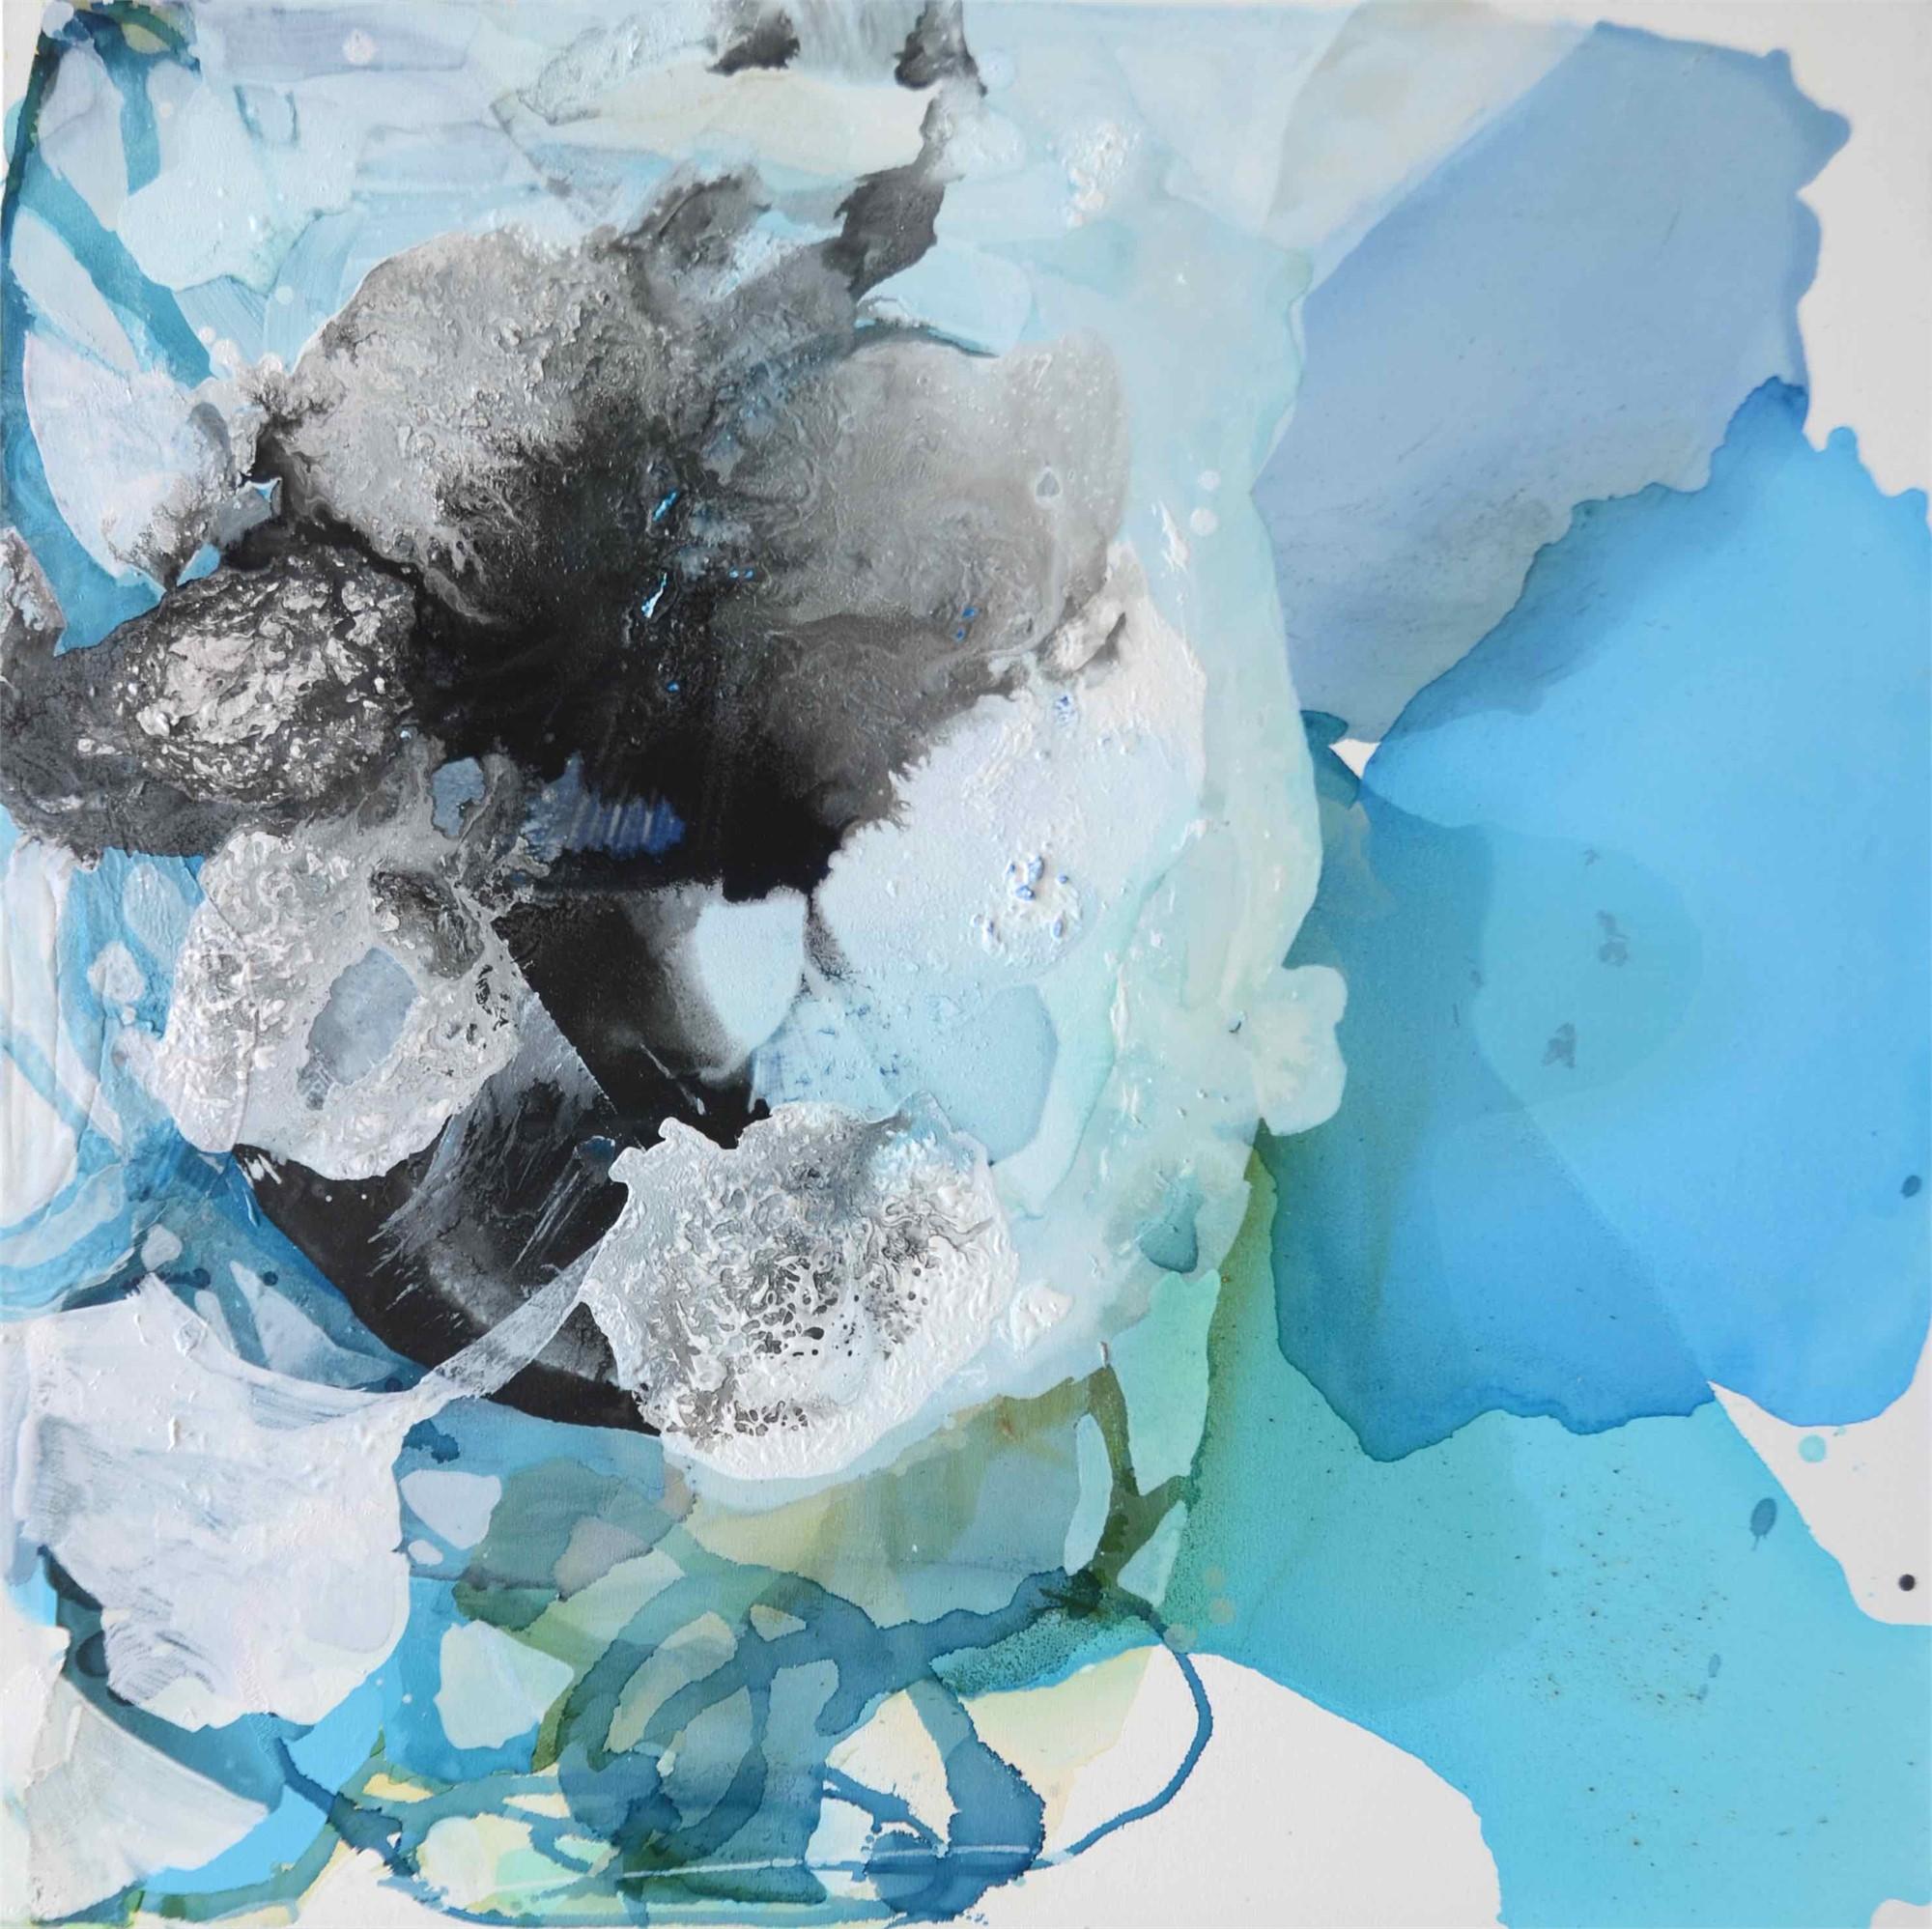 Spring 2 by Liz Barber